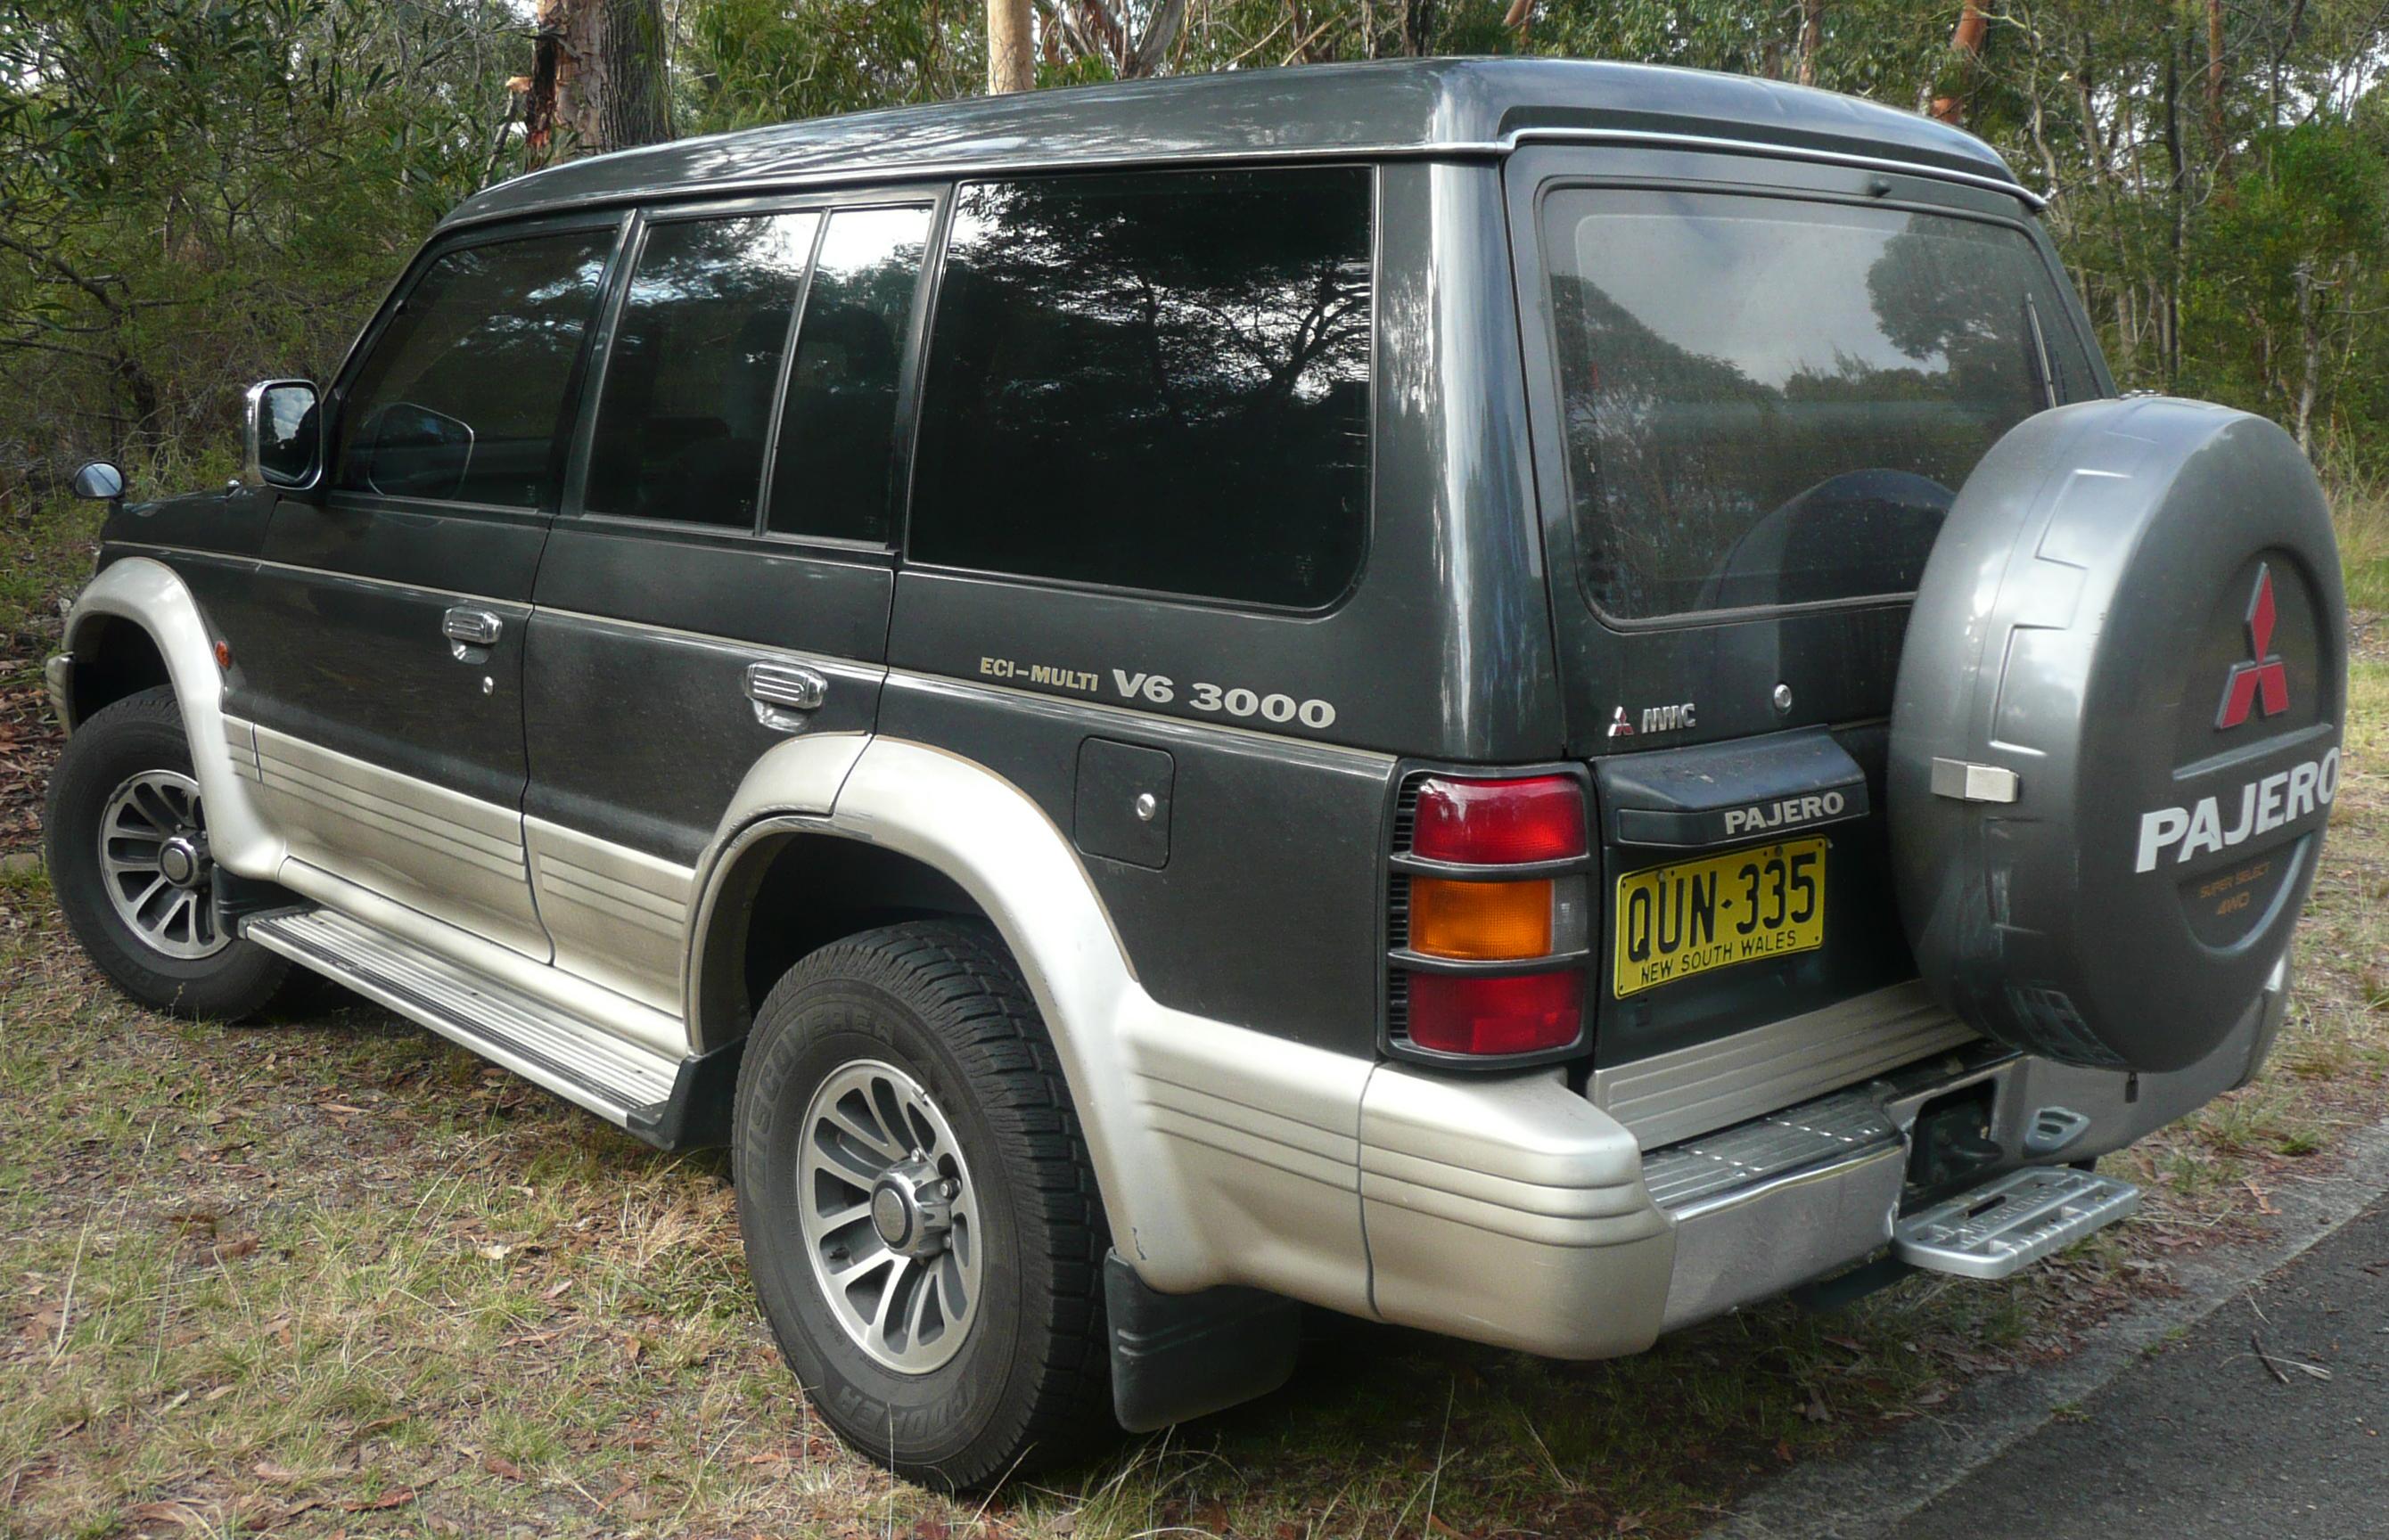 New Mitsubishi 3000gt >> File:1991-1993 Mitsubishi Pajero (NH) V6 3000 wagon 02.jpg ...